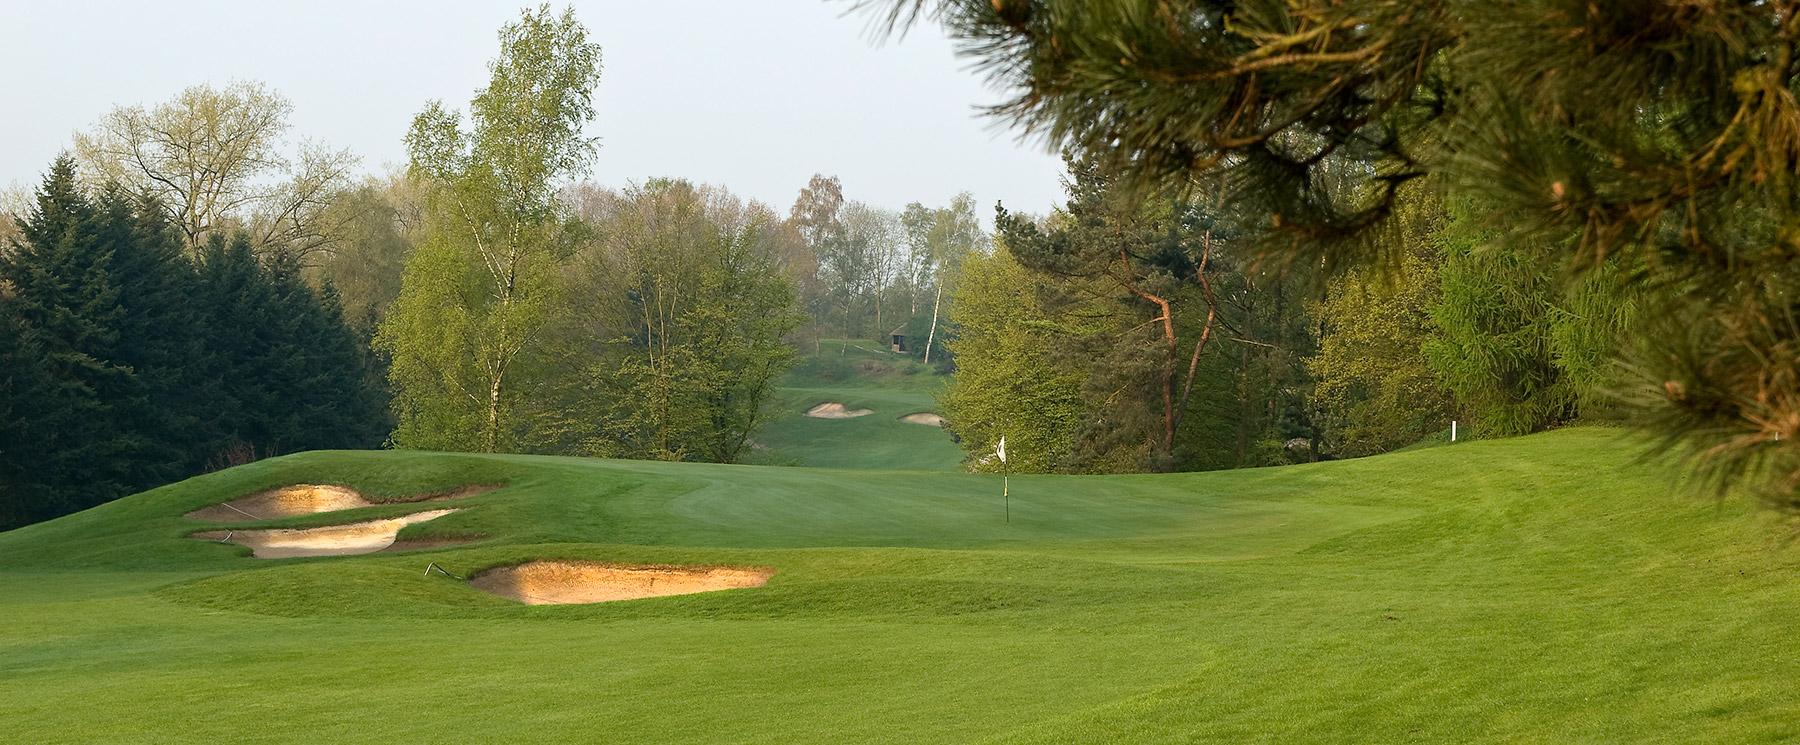 Düsseldorfer Golf Club Datenschutz